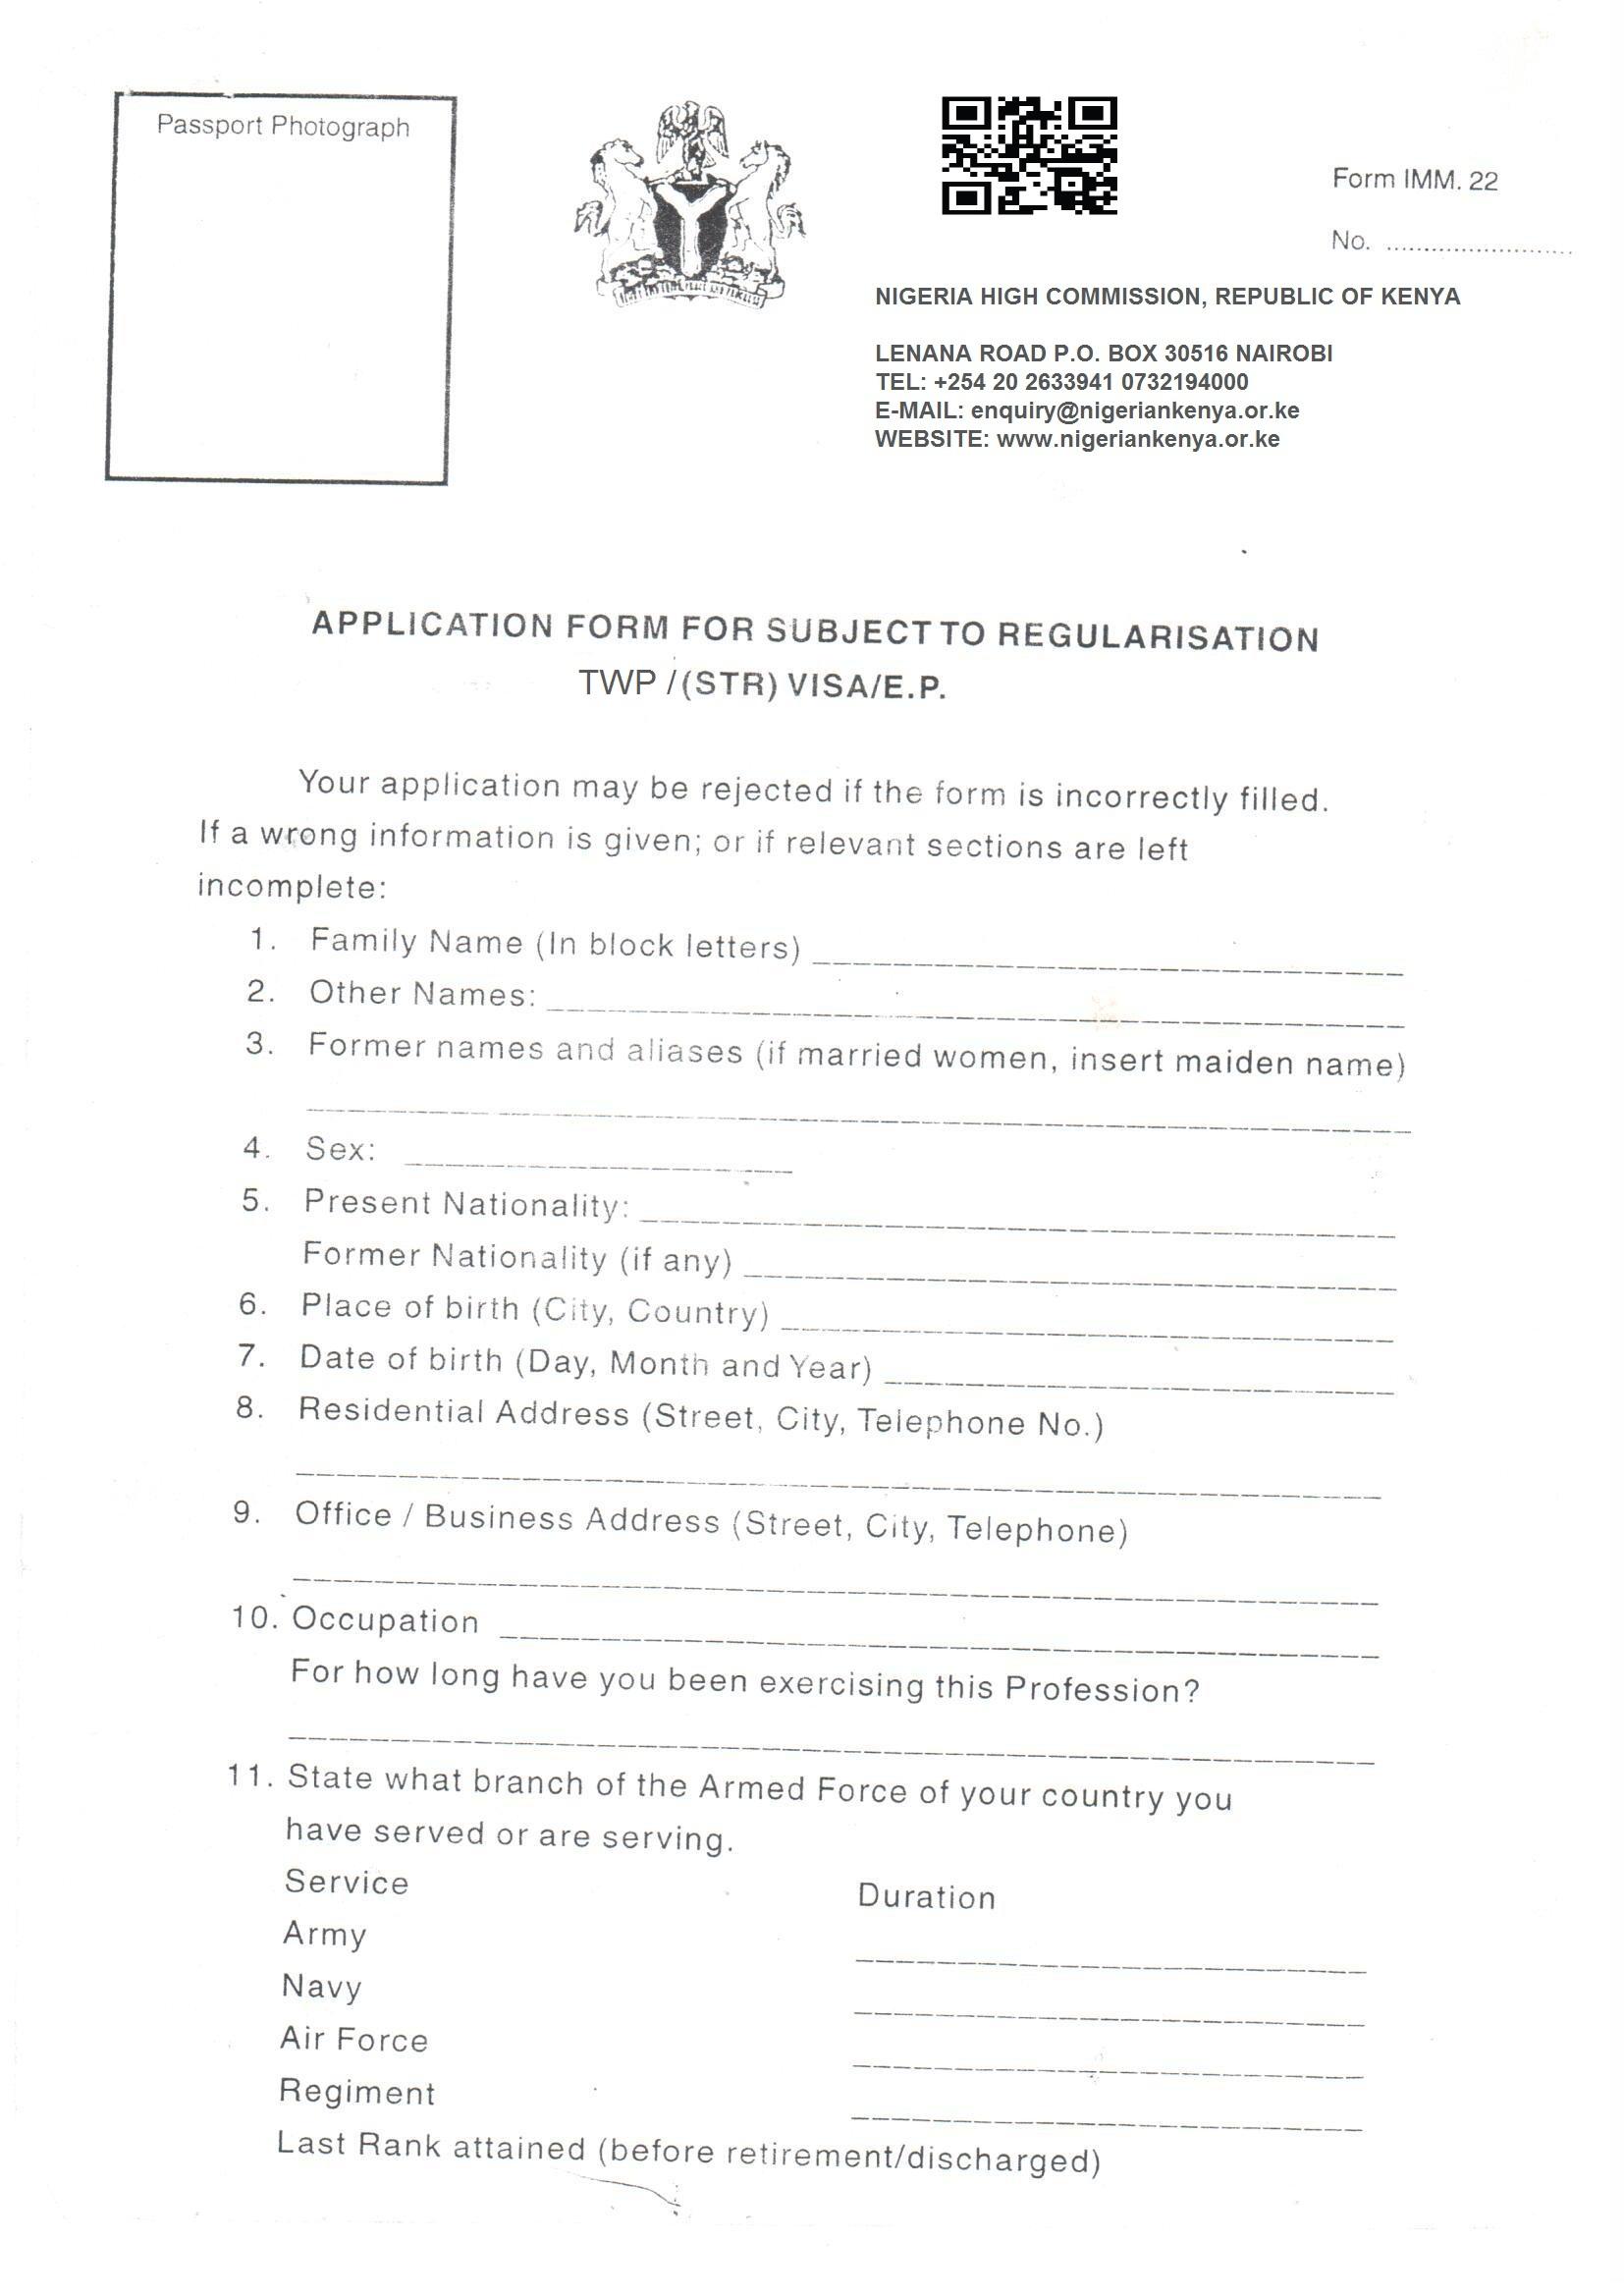 Nigerian Passport Renewal Form Pdf